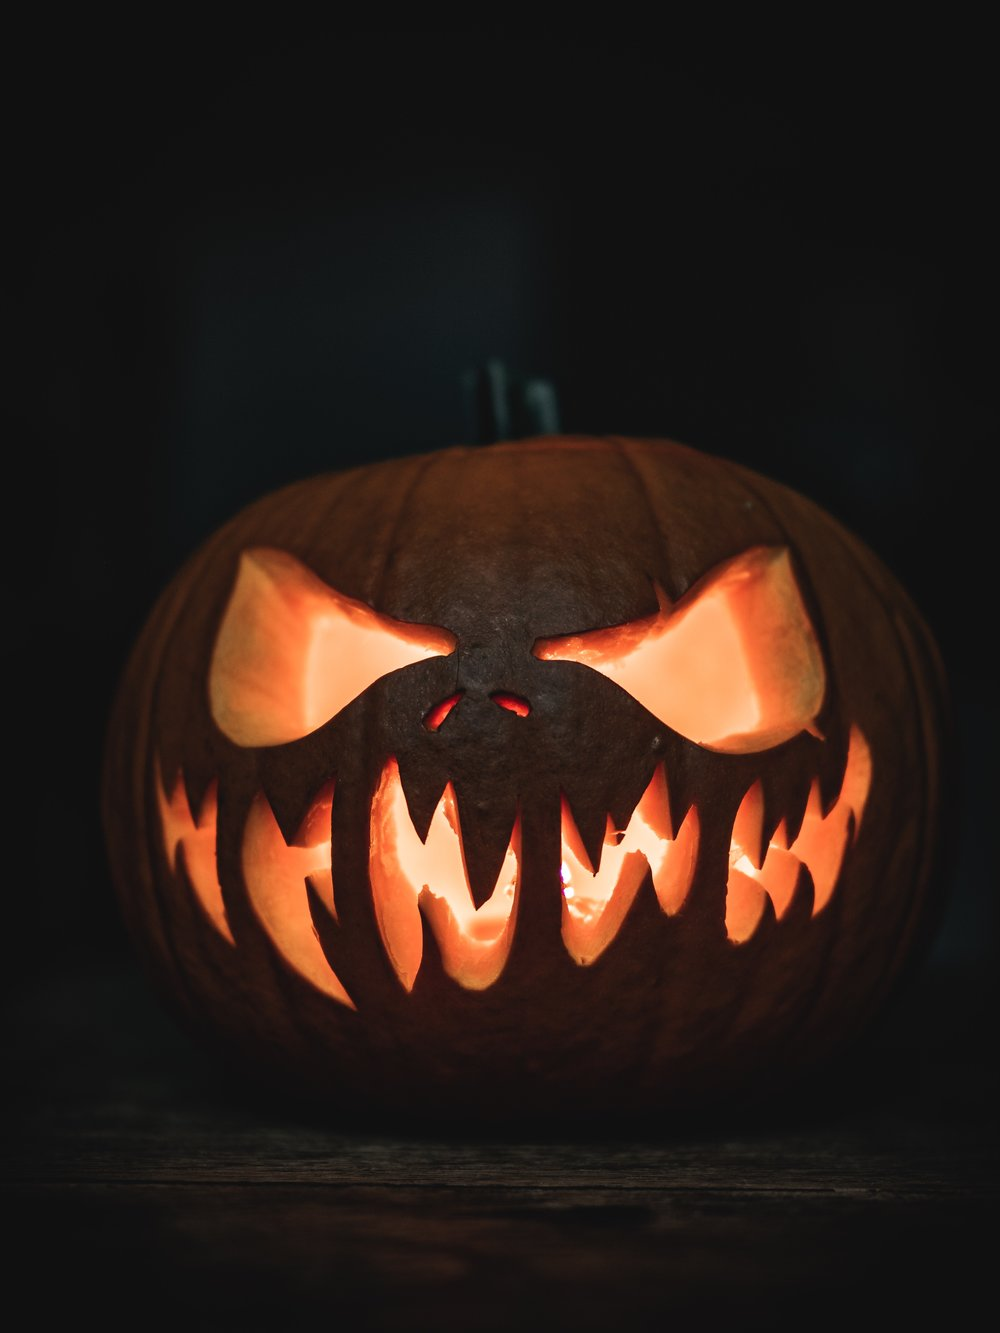 Halloween Pumpkin Carving Jack-o-Lantern Art Craft Creativity Scary